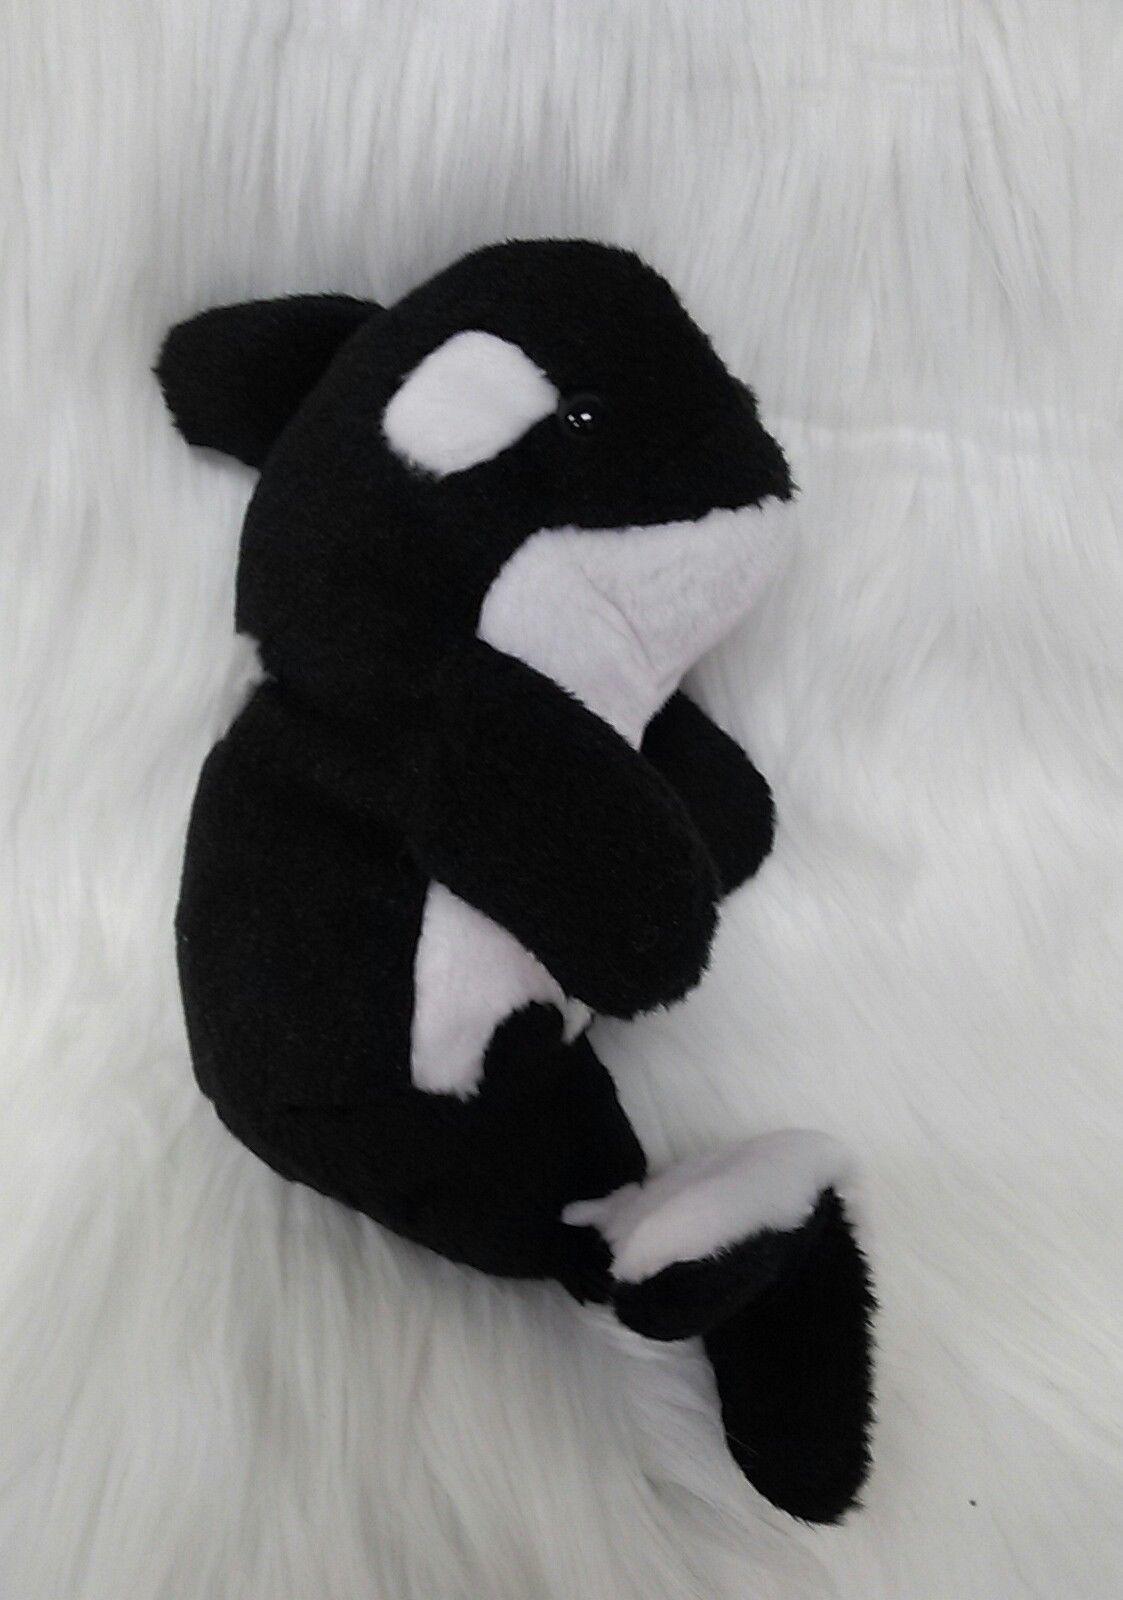 "12"" Orca Shamu Whale Black White The Petting Zoo 1994 Plush Stuffed Toy B278"